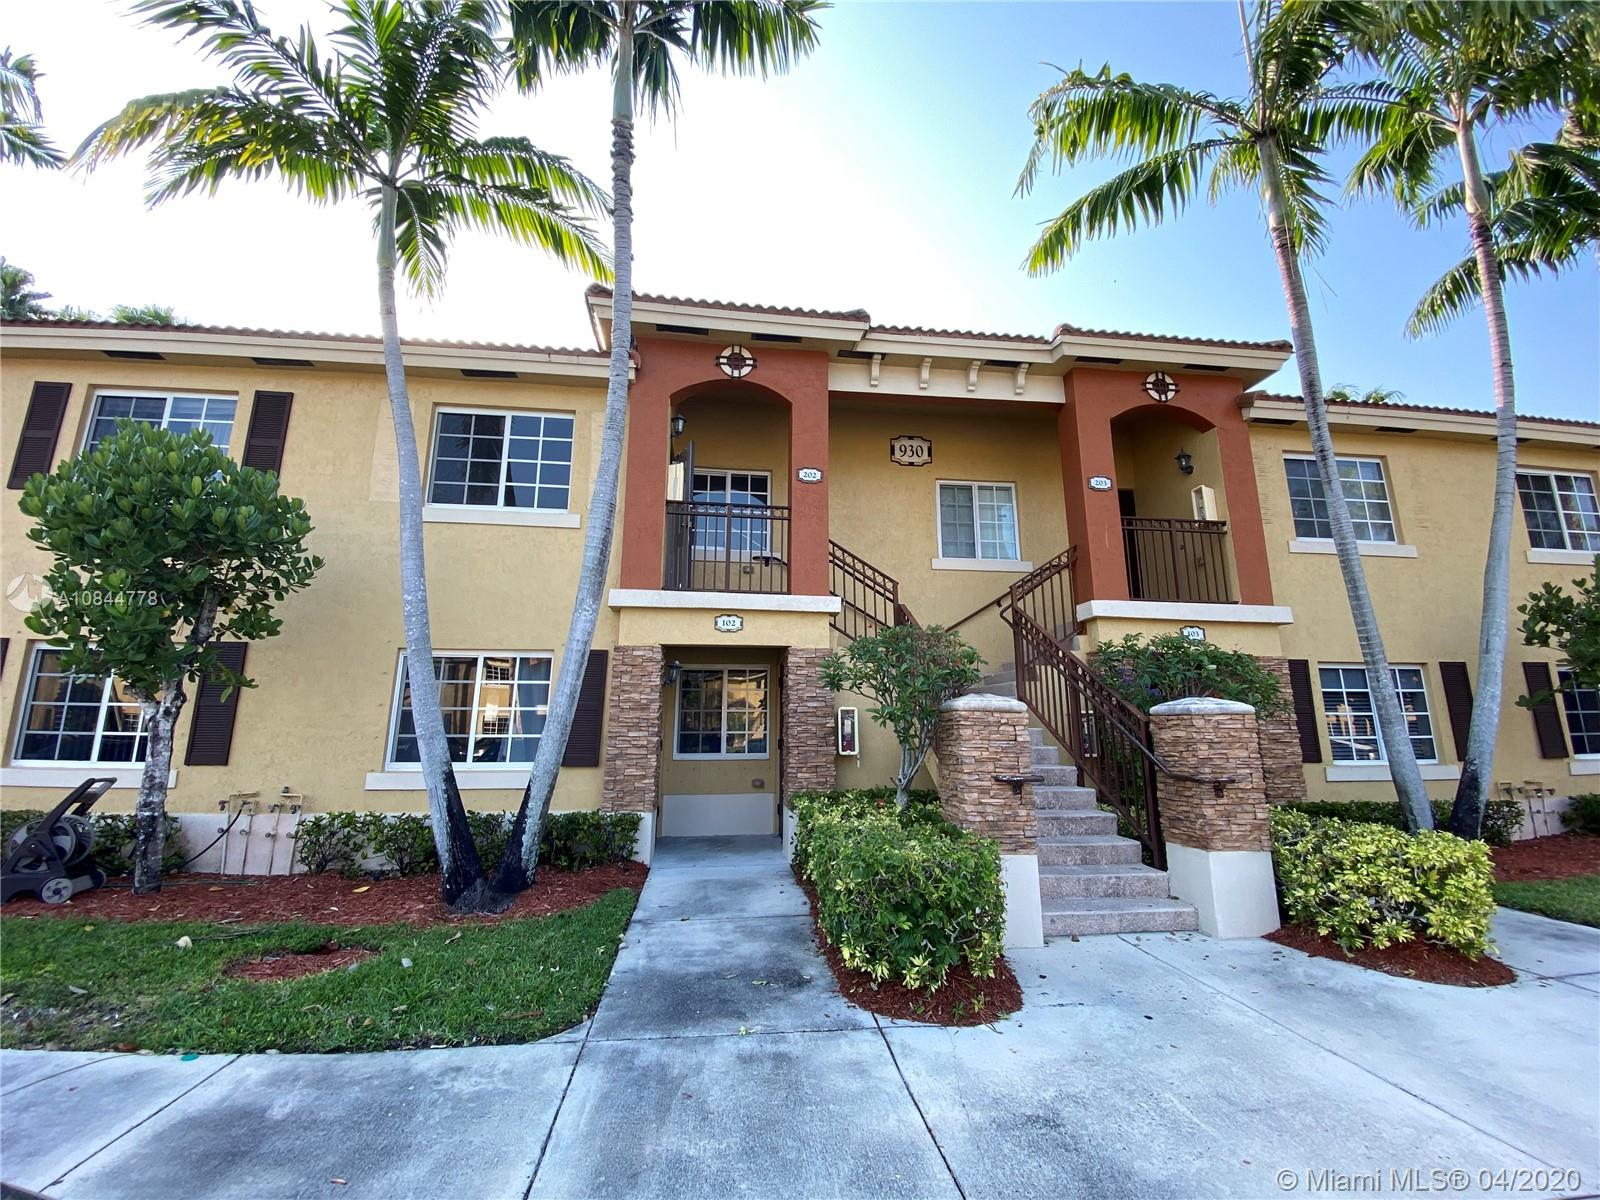 930 NE 34th Ave #202, Homestead, FL 33033 - Homestead, FL real estate listing